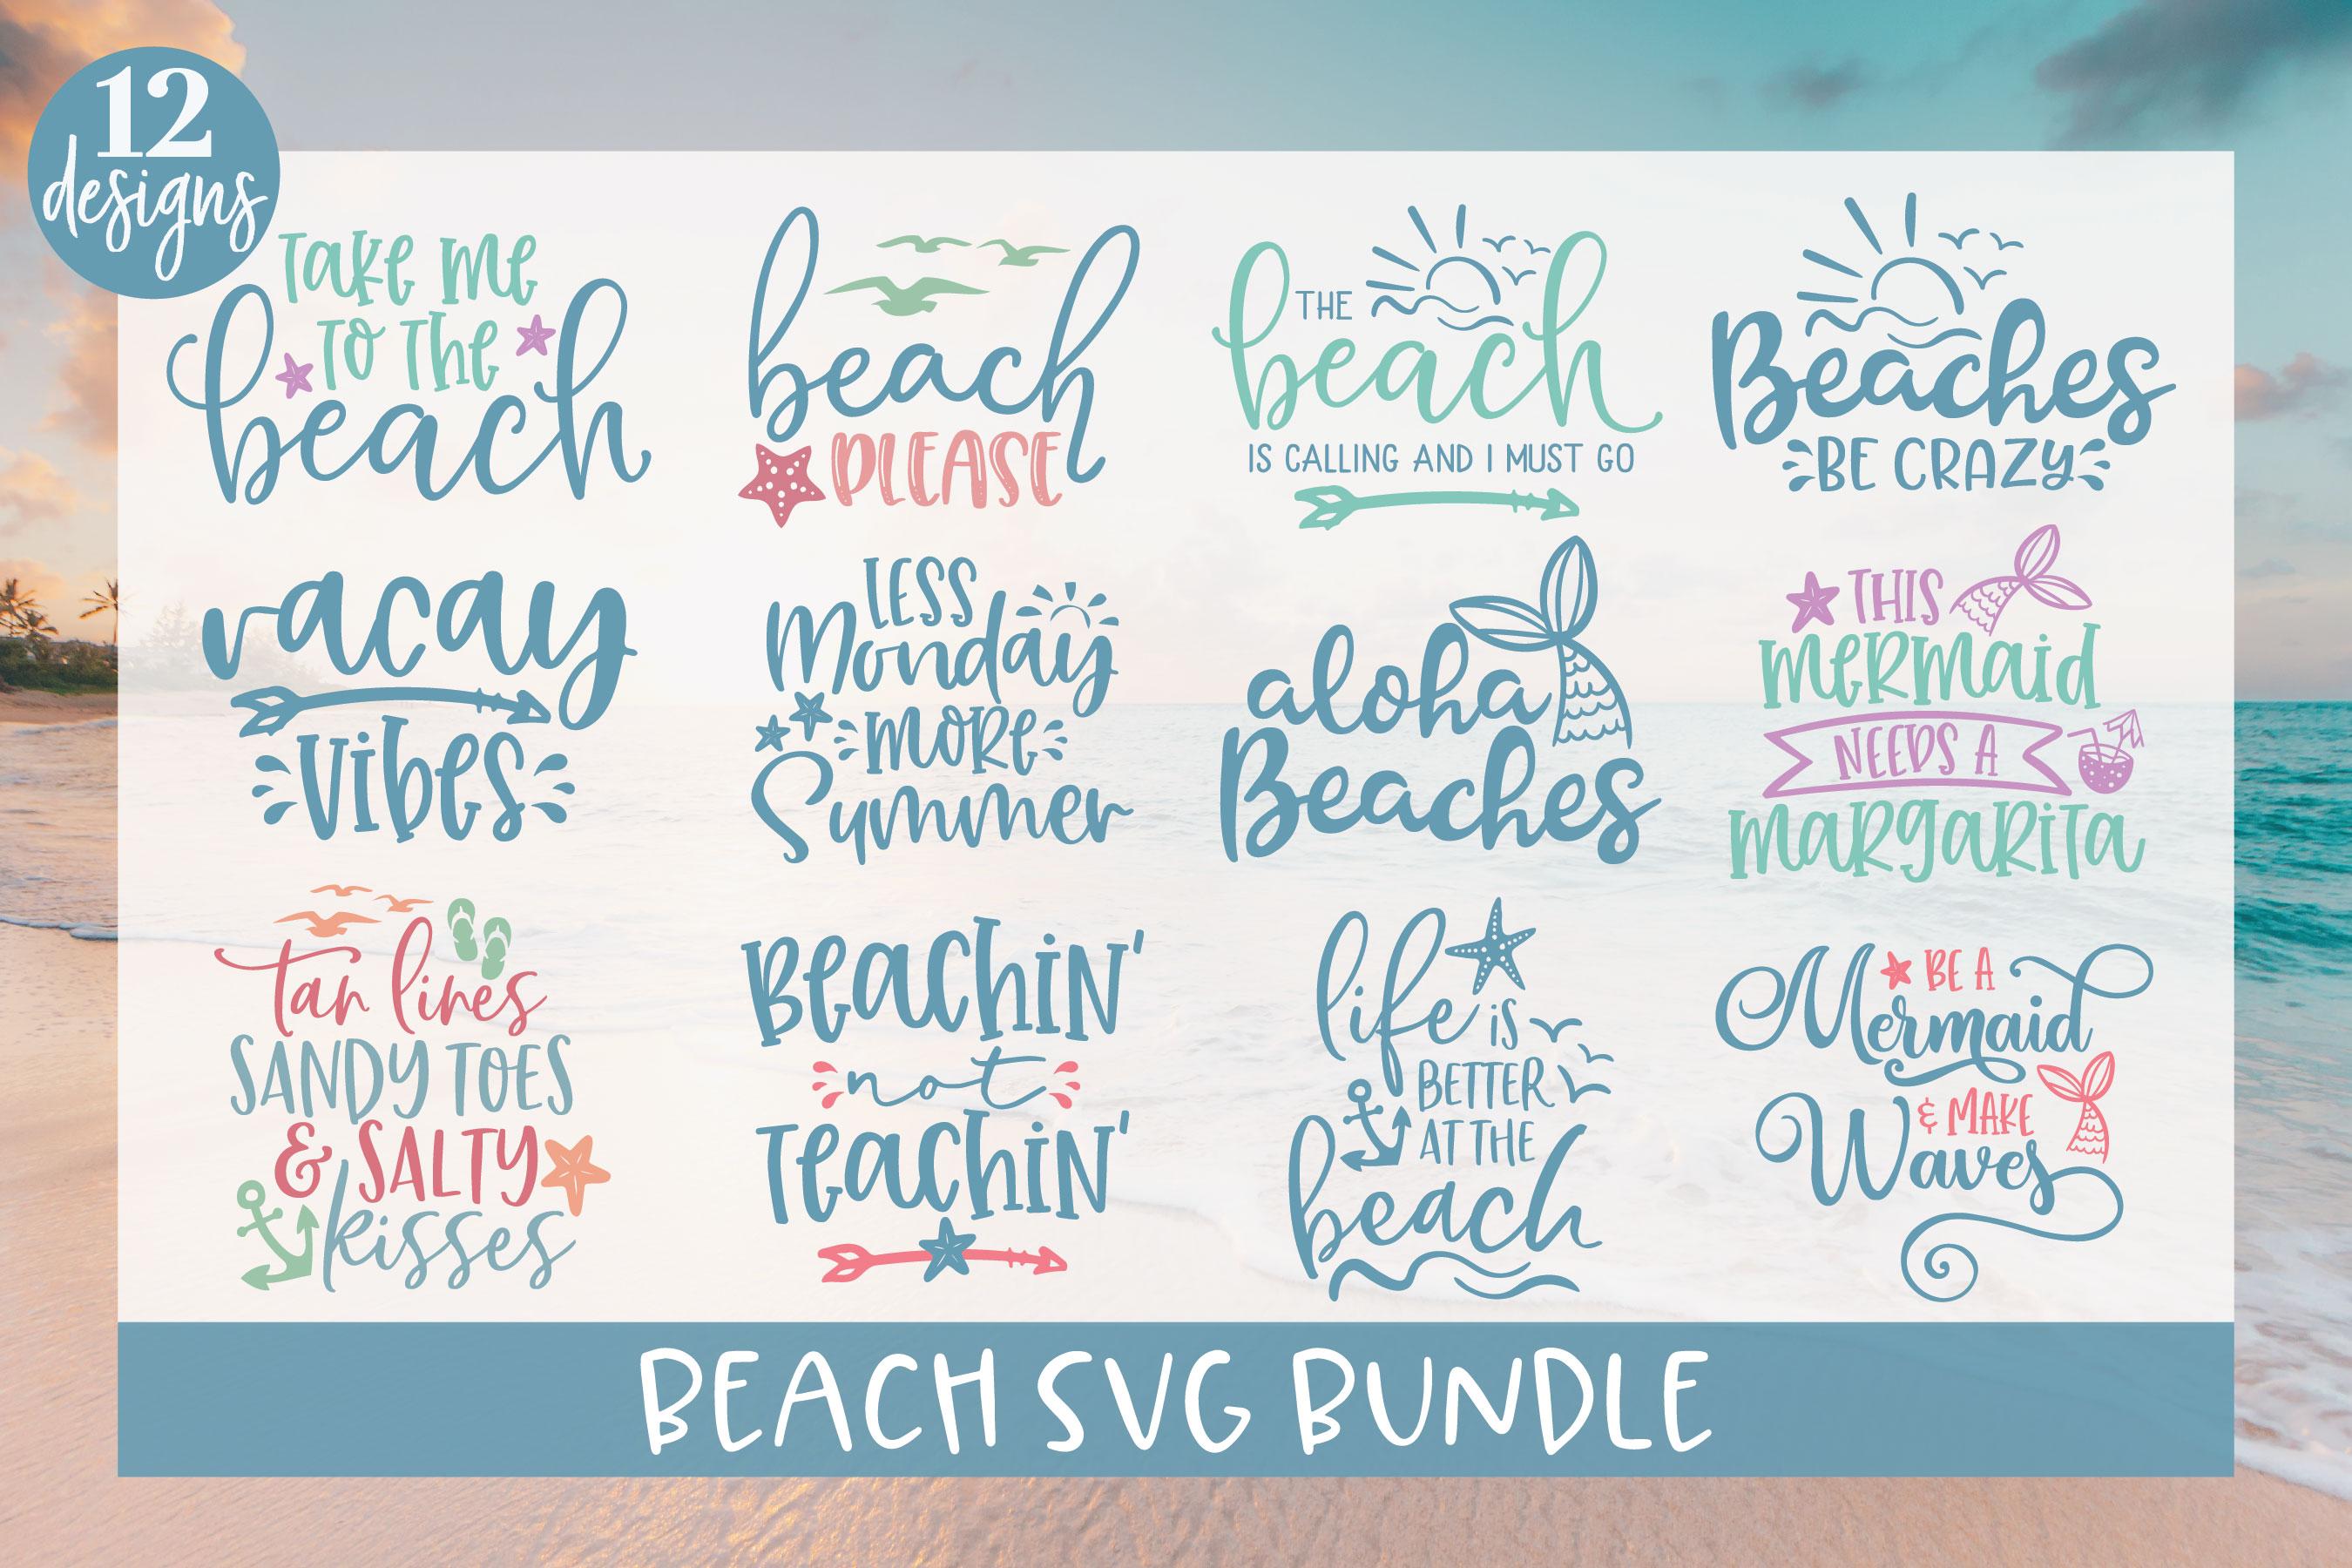 Beach SVG Bundle - 12 Summer SVG Cut Files example image 1